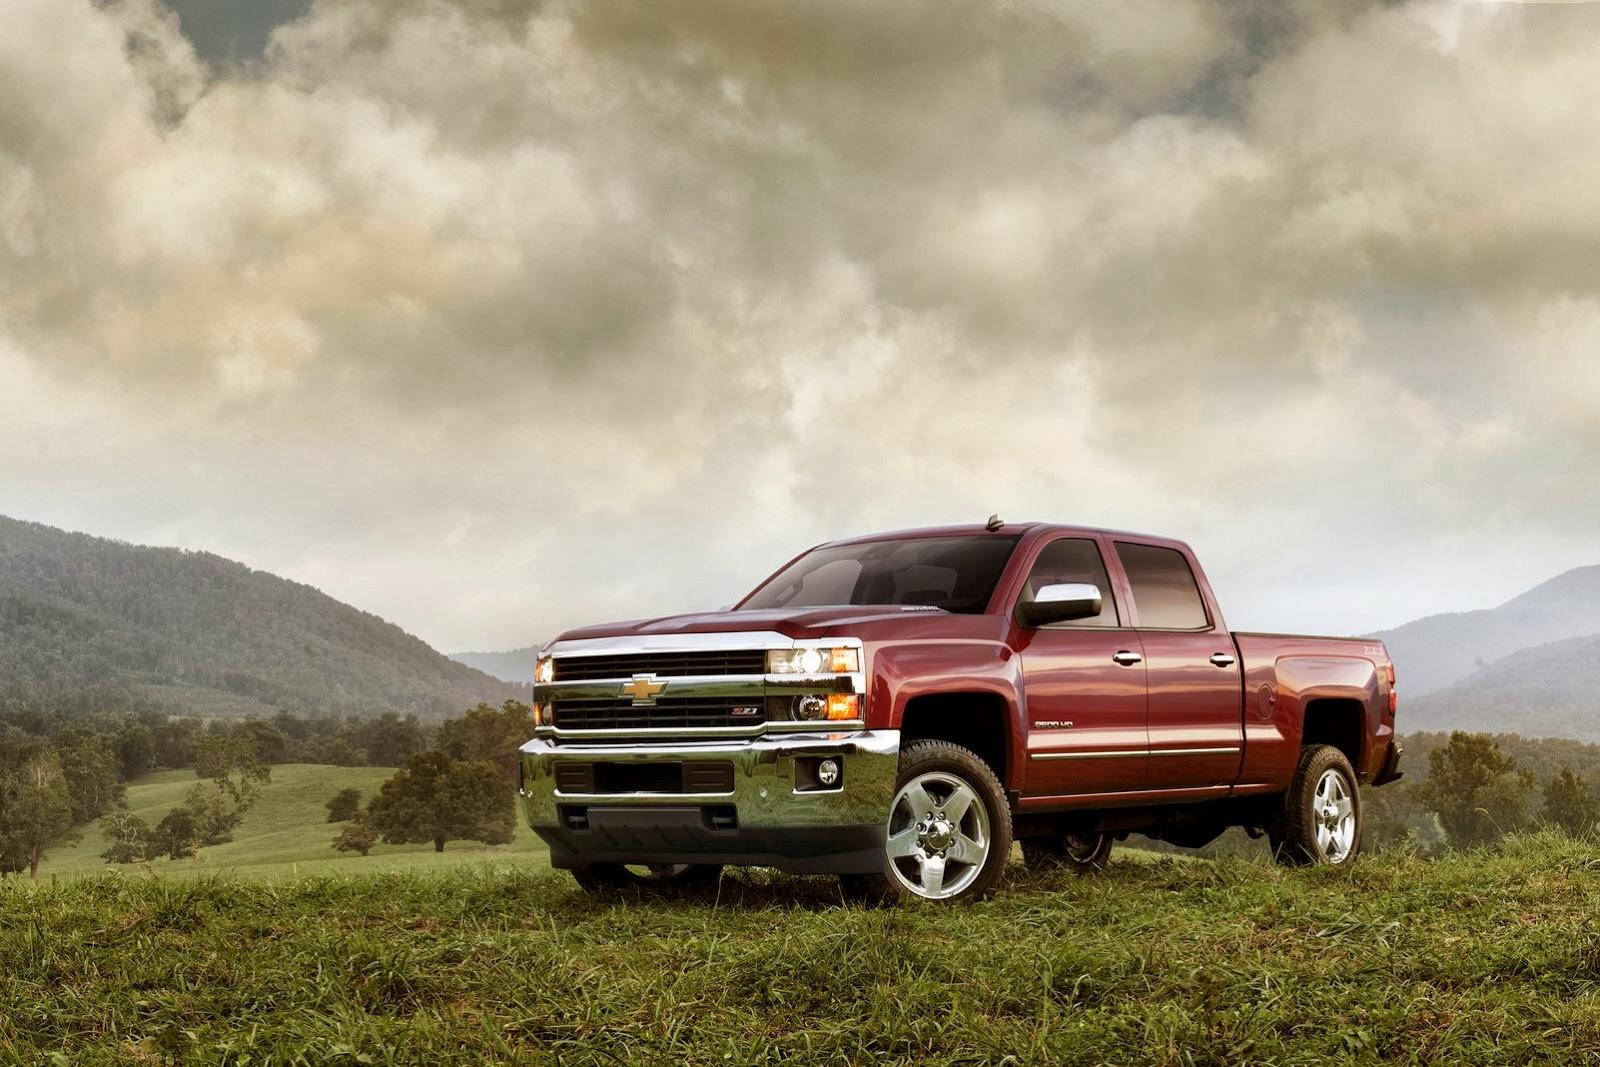 2015-Chevrolet-Silverado-3500-HD-16%25255B2%25255D.jpg